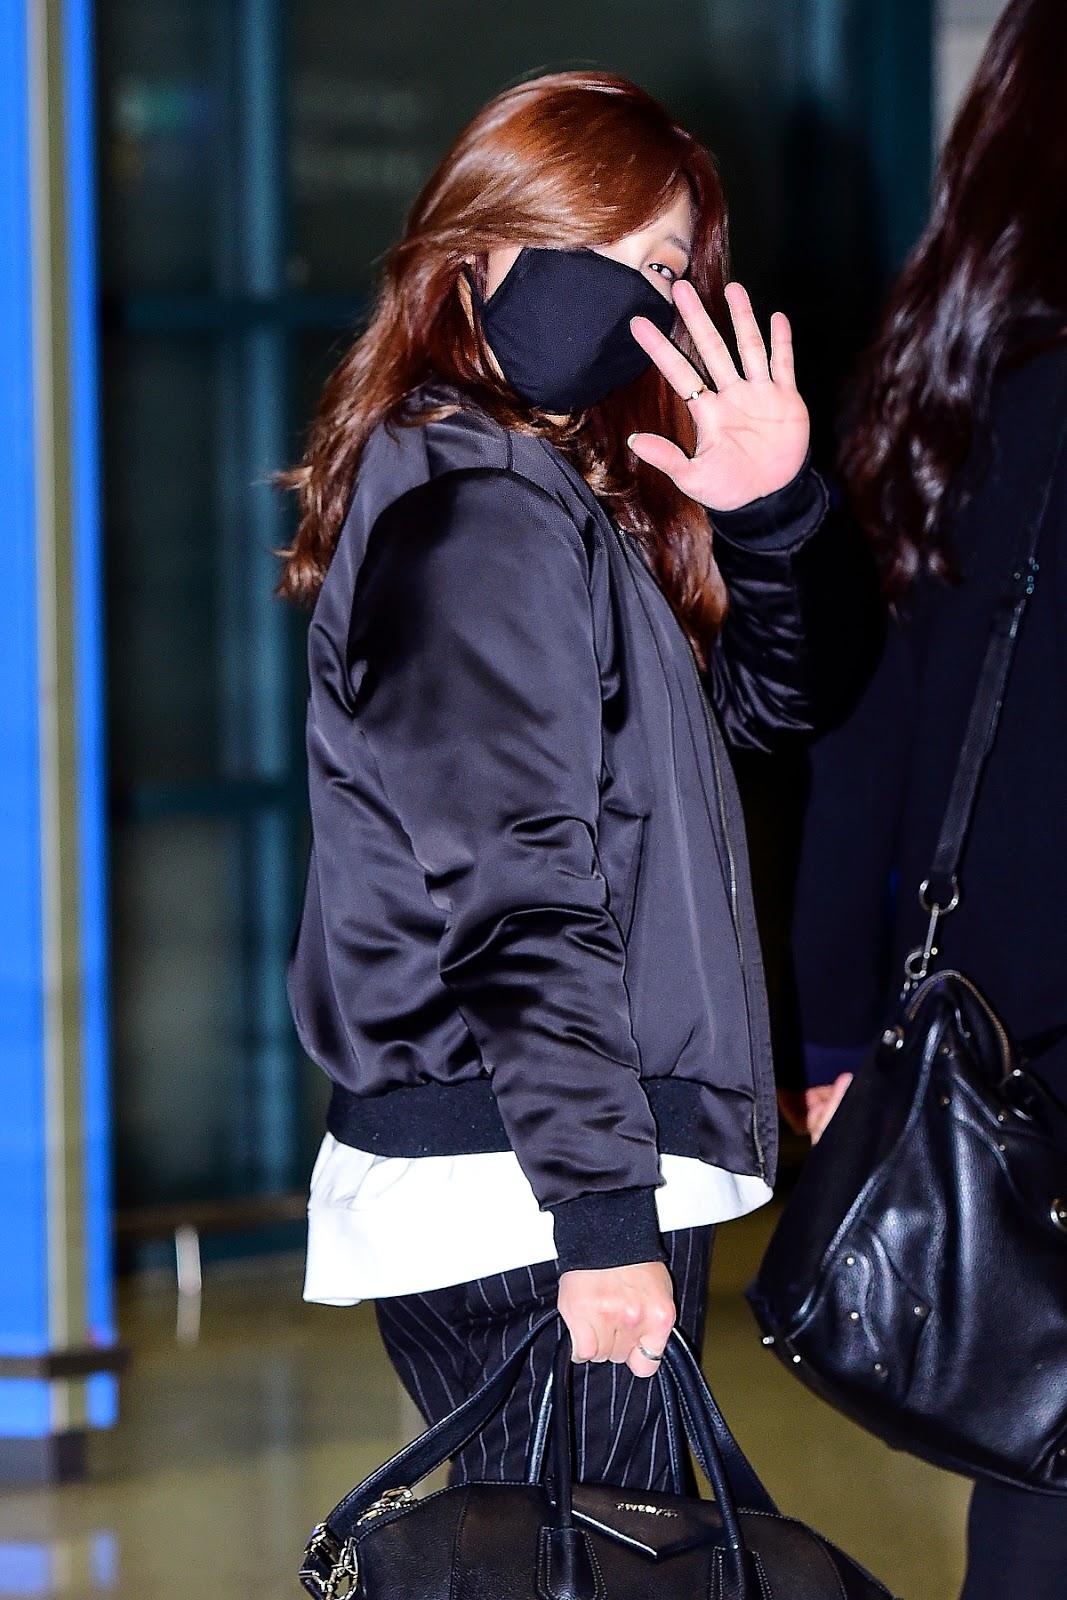 Kpop: Why Do Kpop Idols Wear Masks? - Kpop Behind